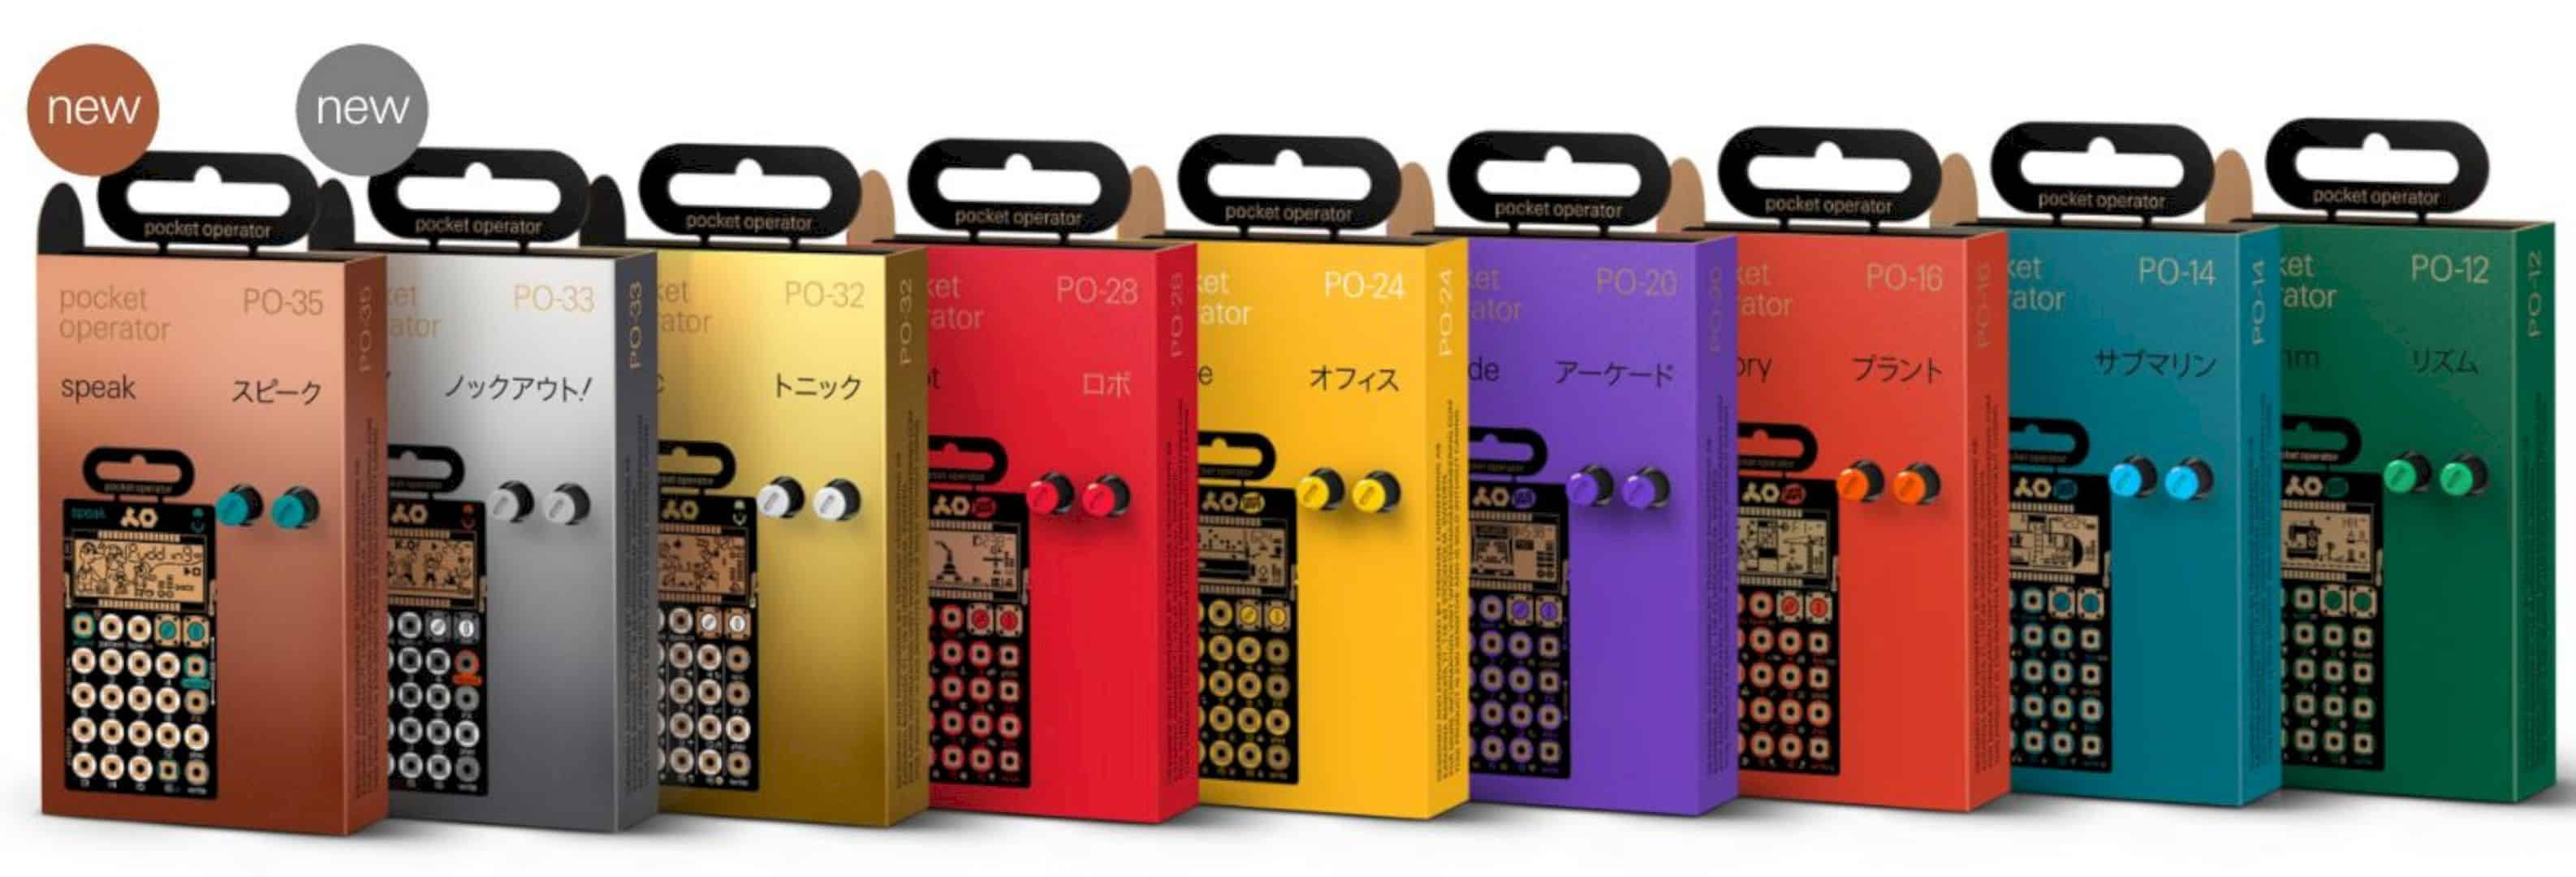 Pocket Operators 4